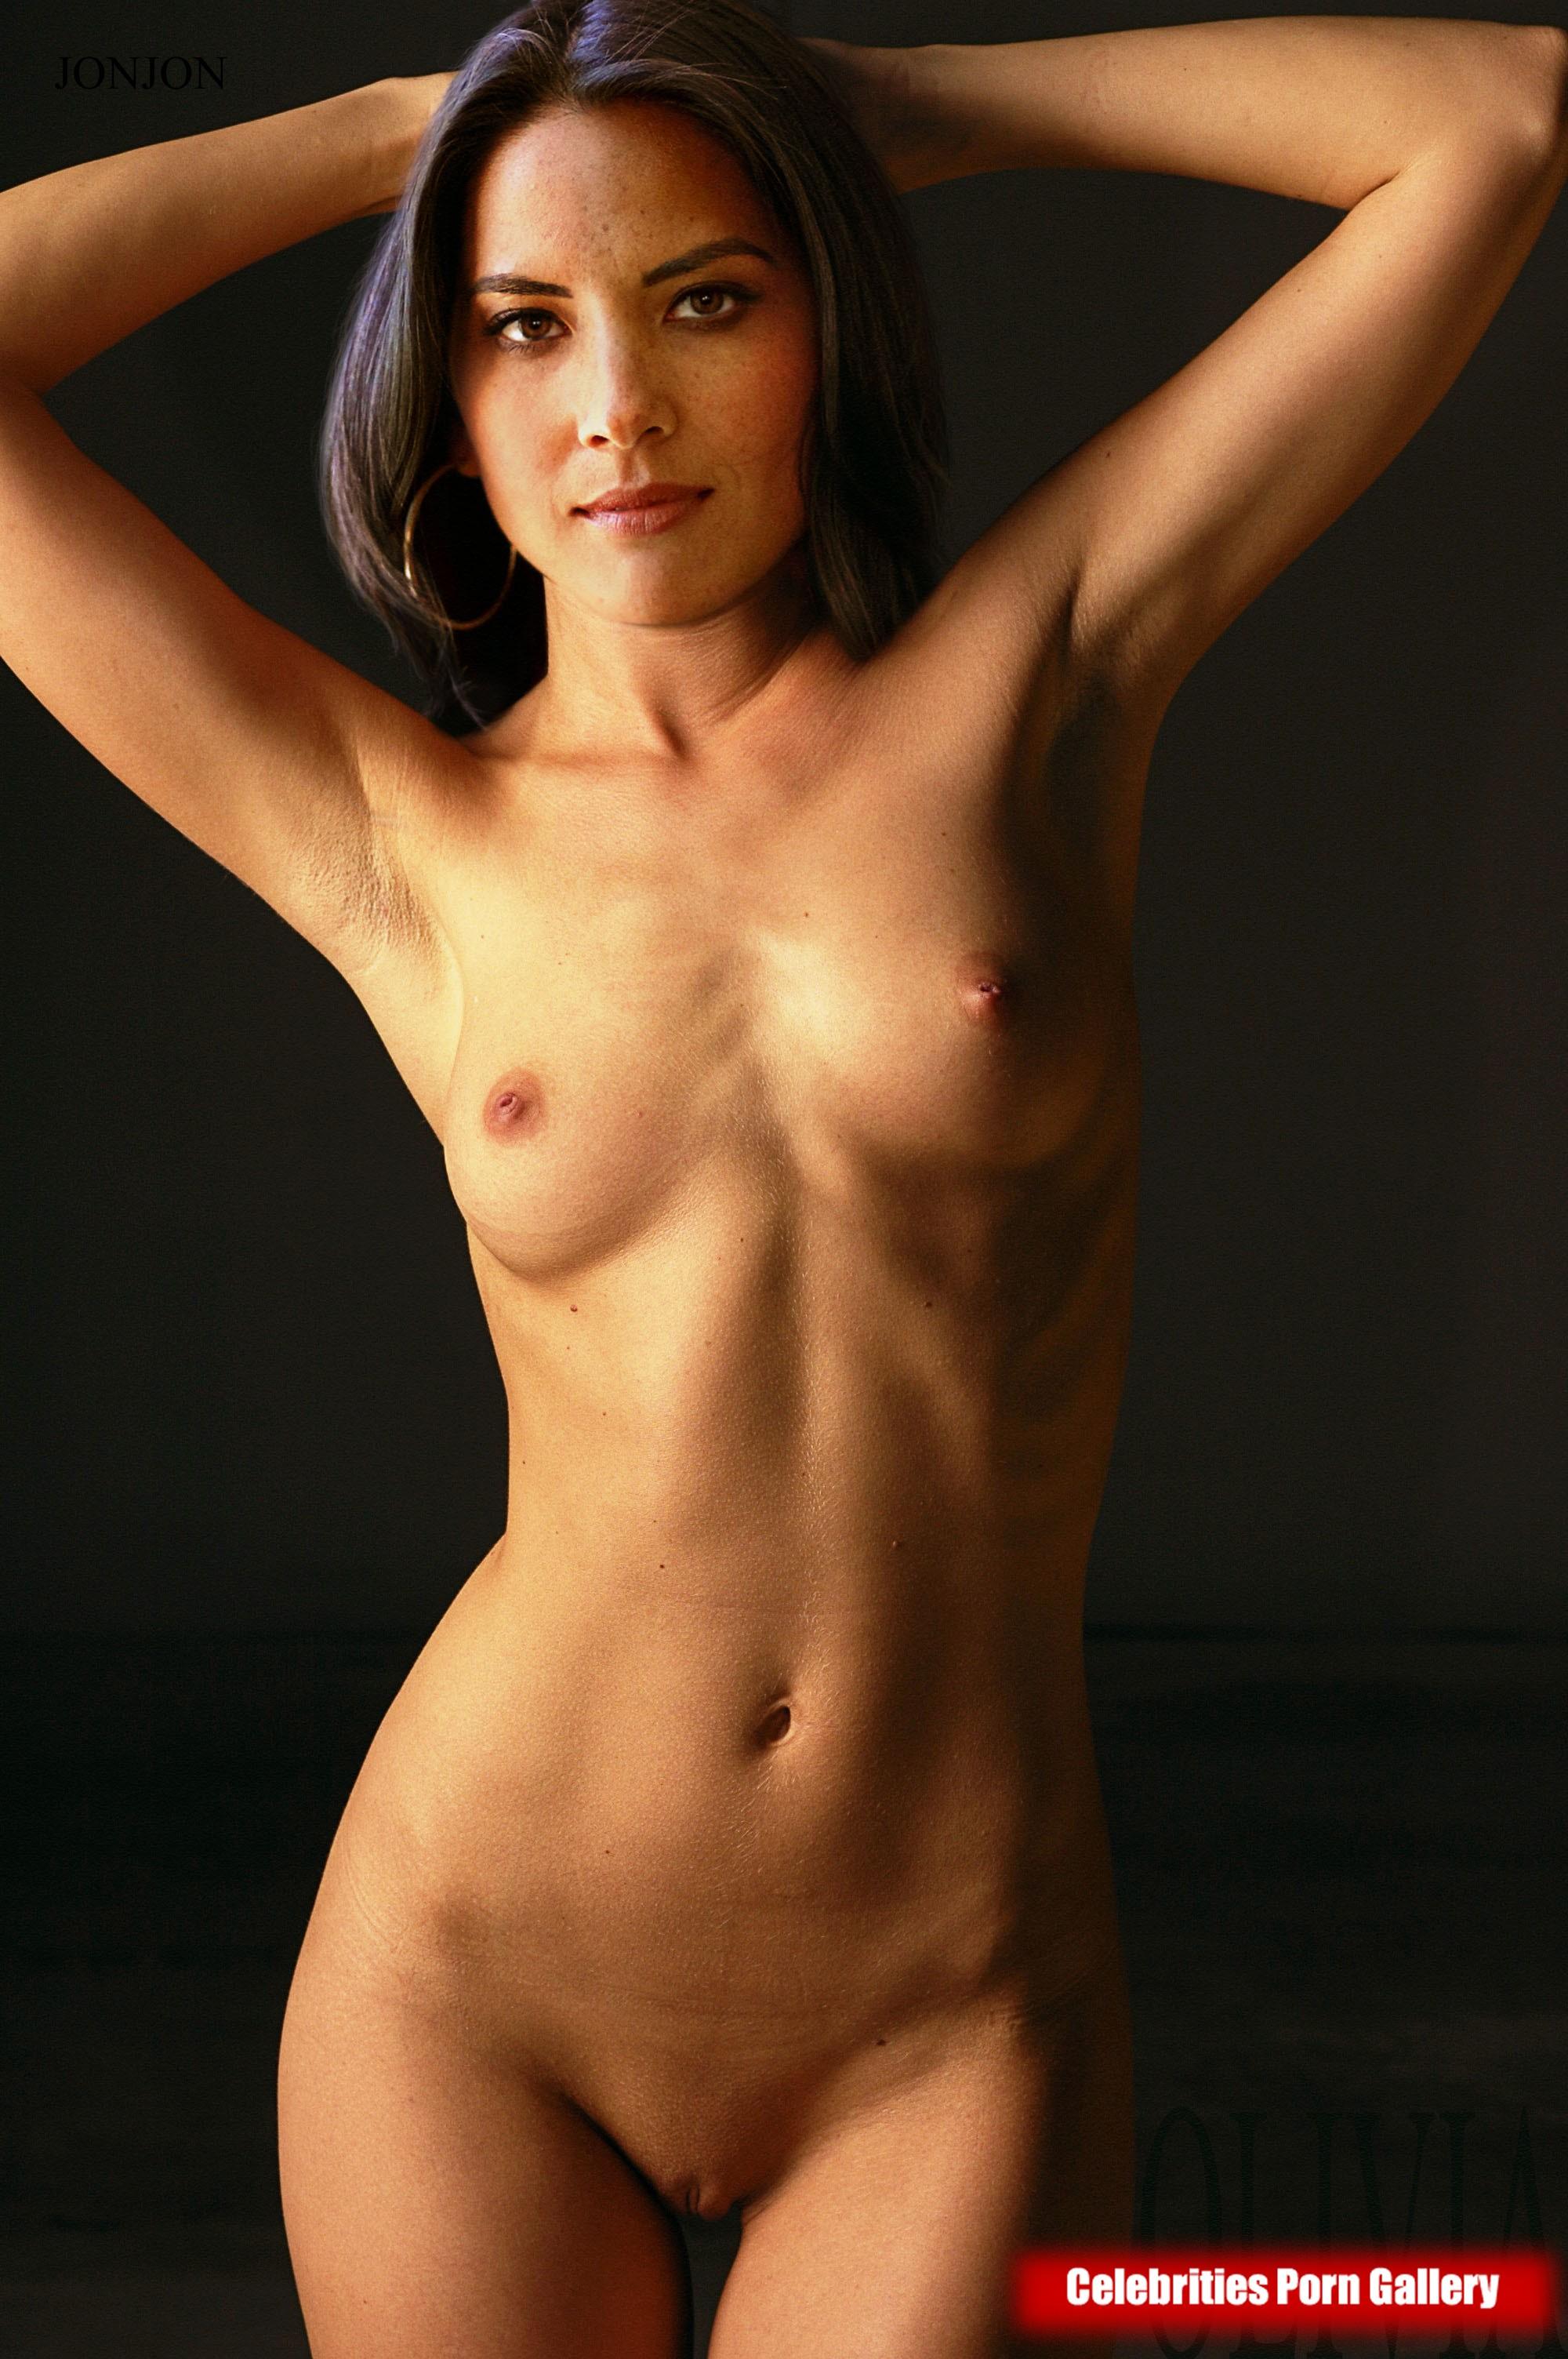 babilona hot and nude pics